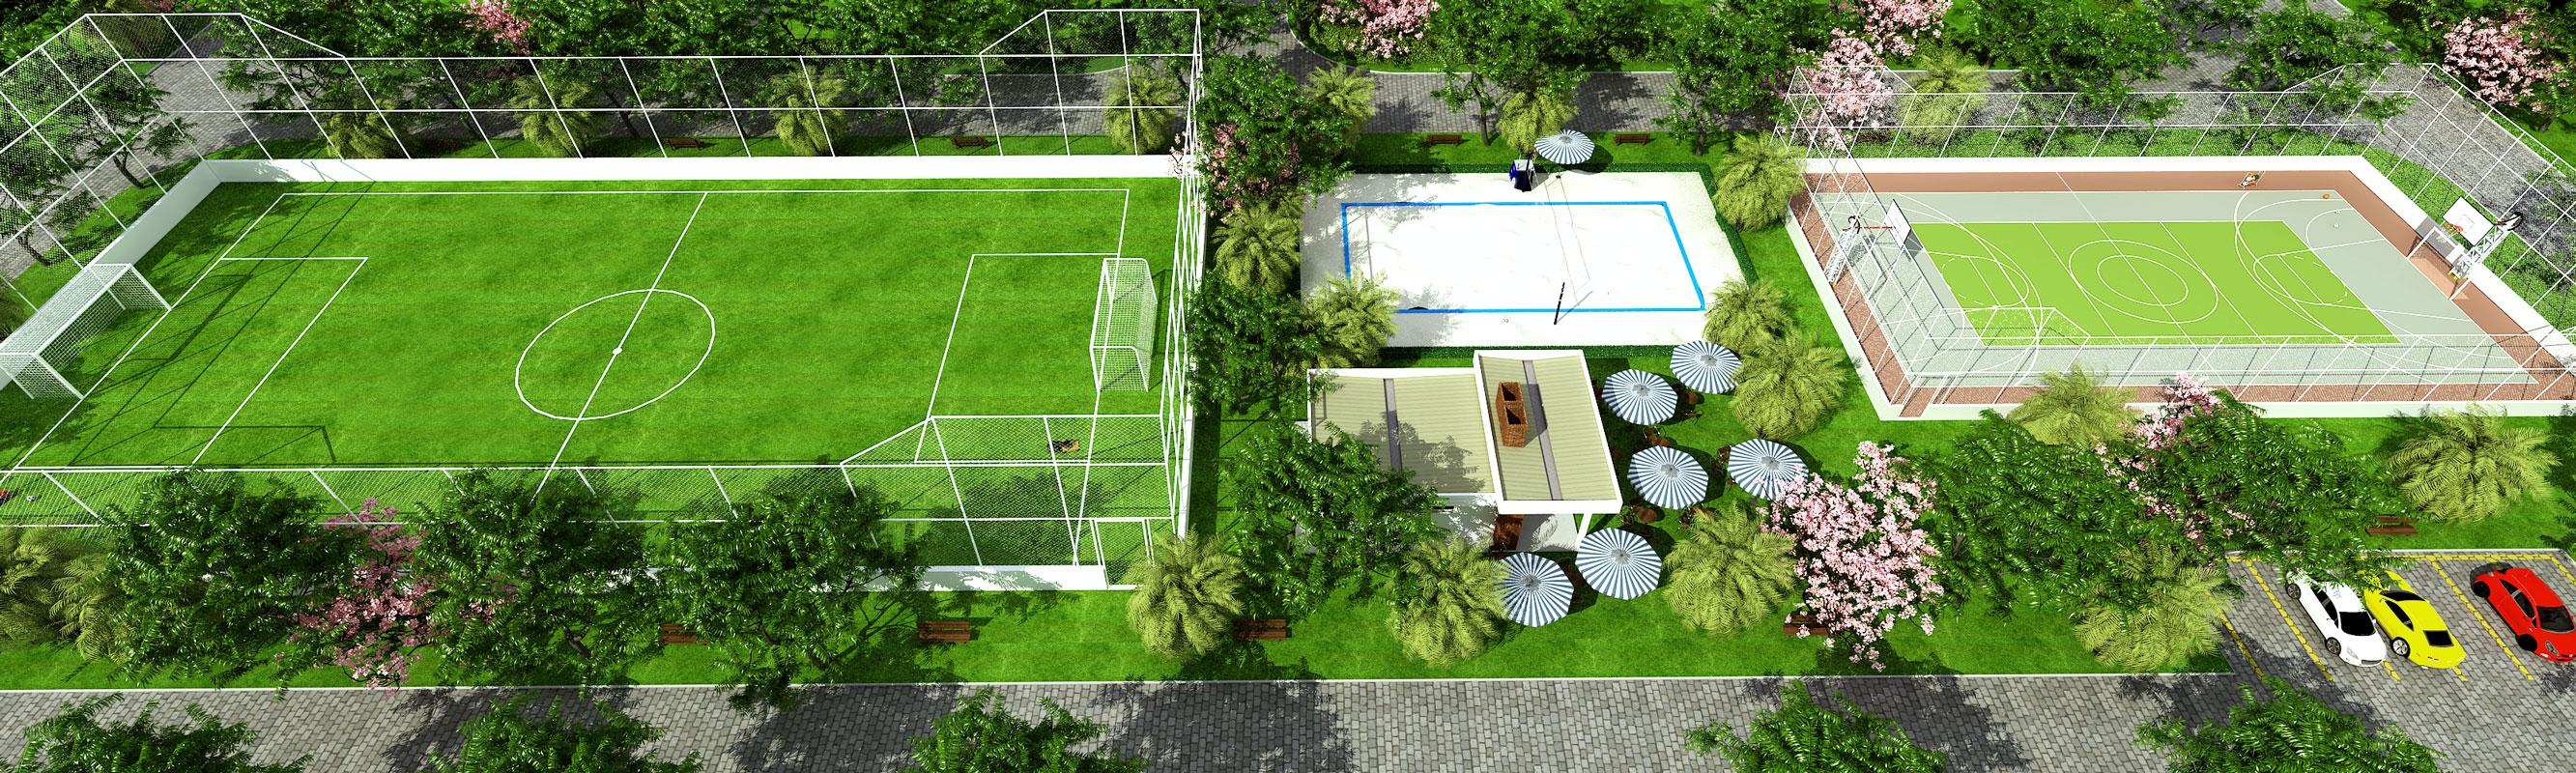 Perspectiva-Ilustrativa-aerea-lazer-02-Royal-Garden-Marica-RJ